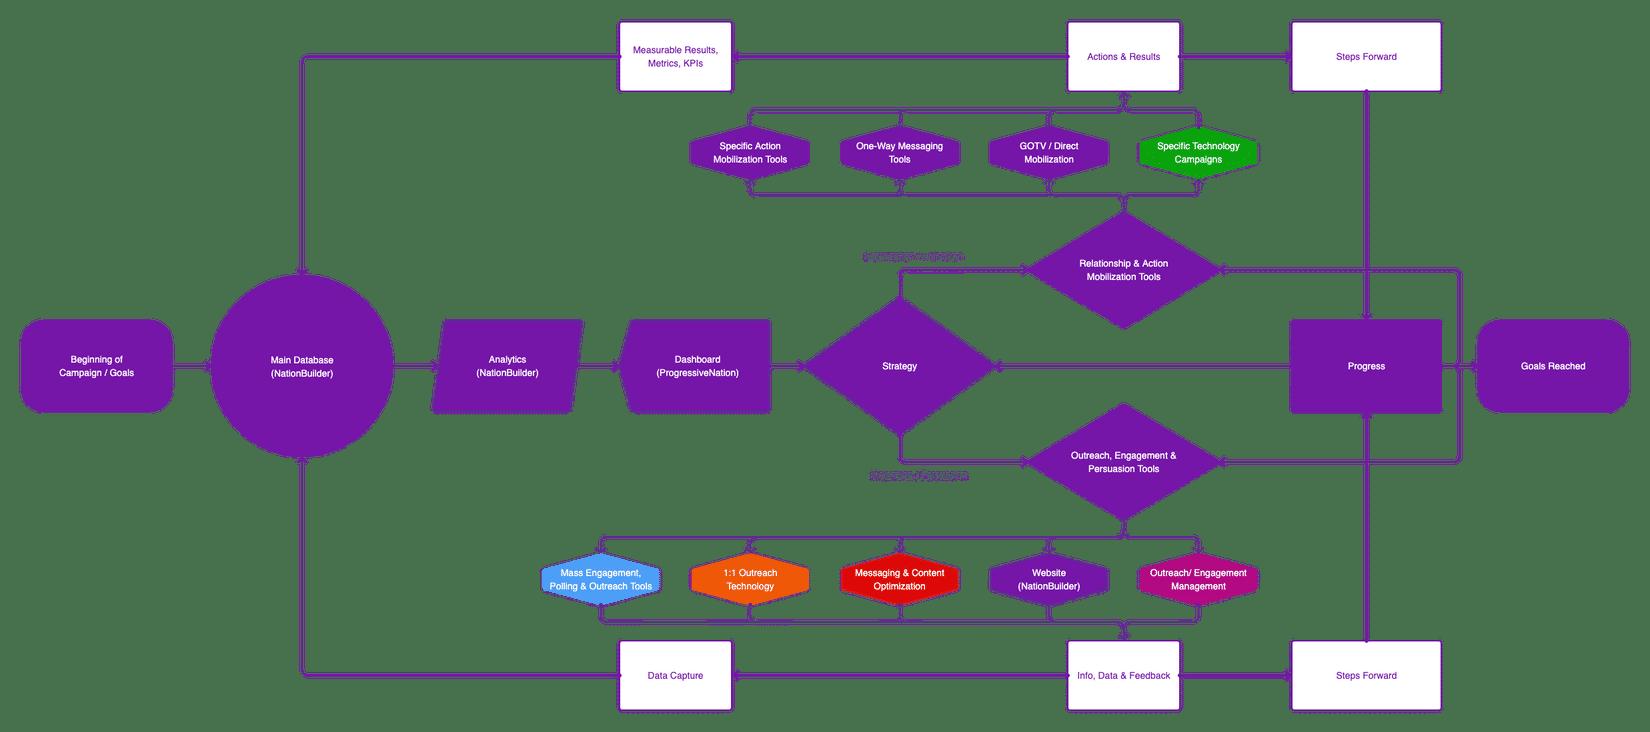 A flow chart explaining Progressive Nation's Path of Progression